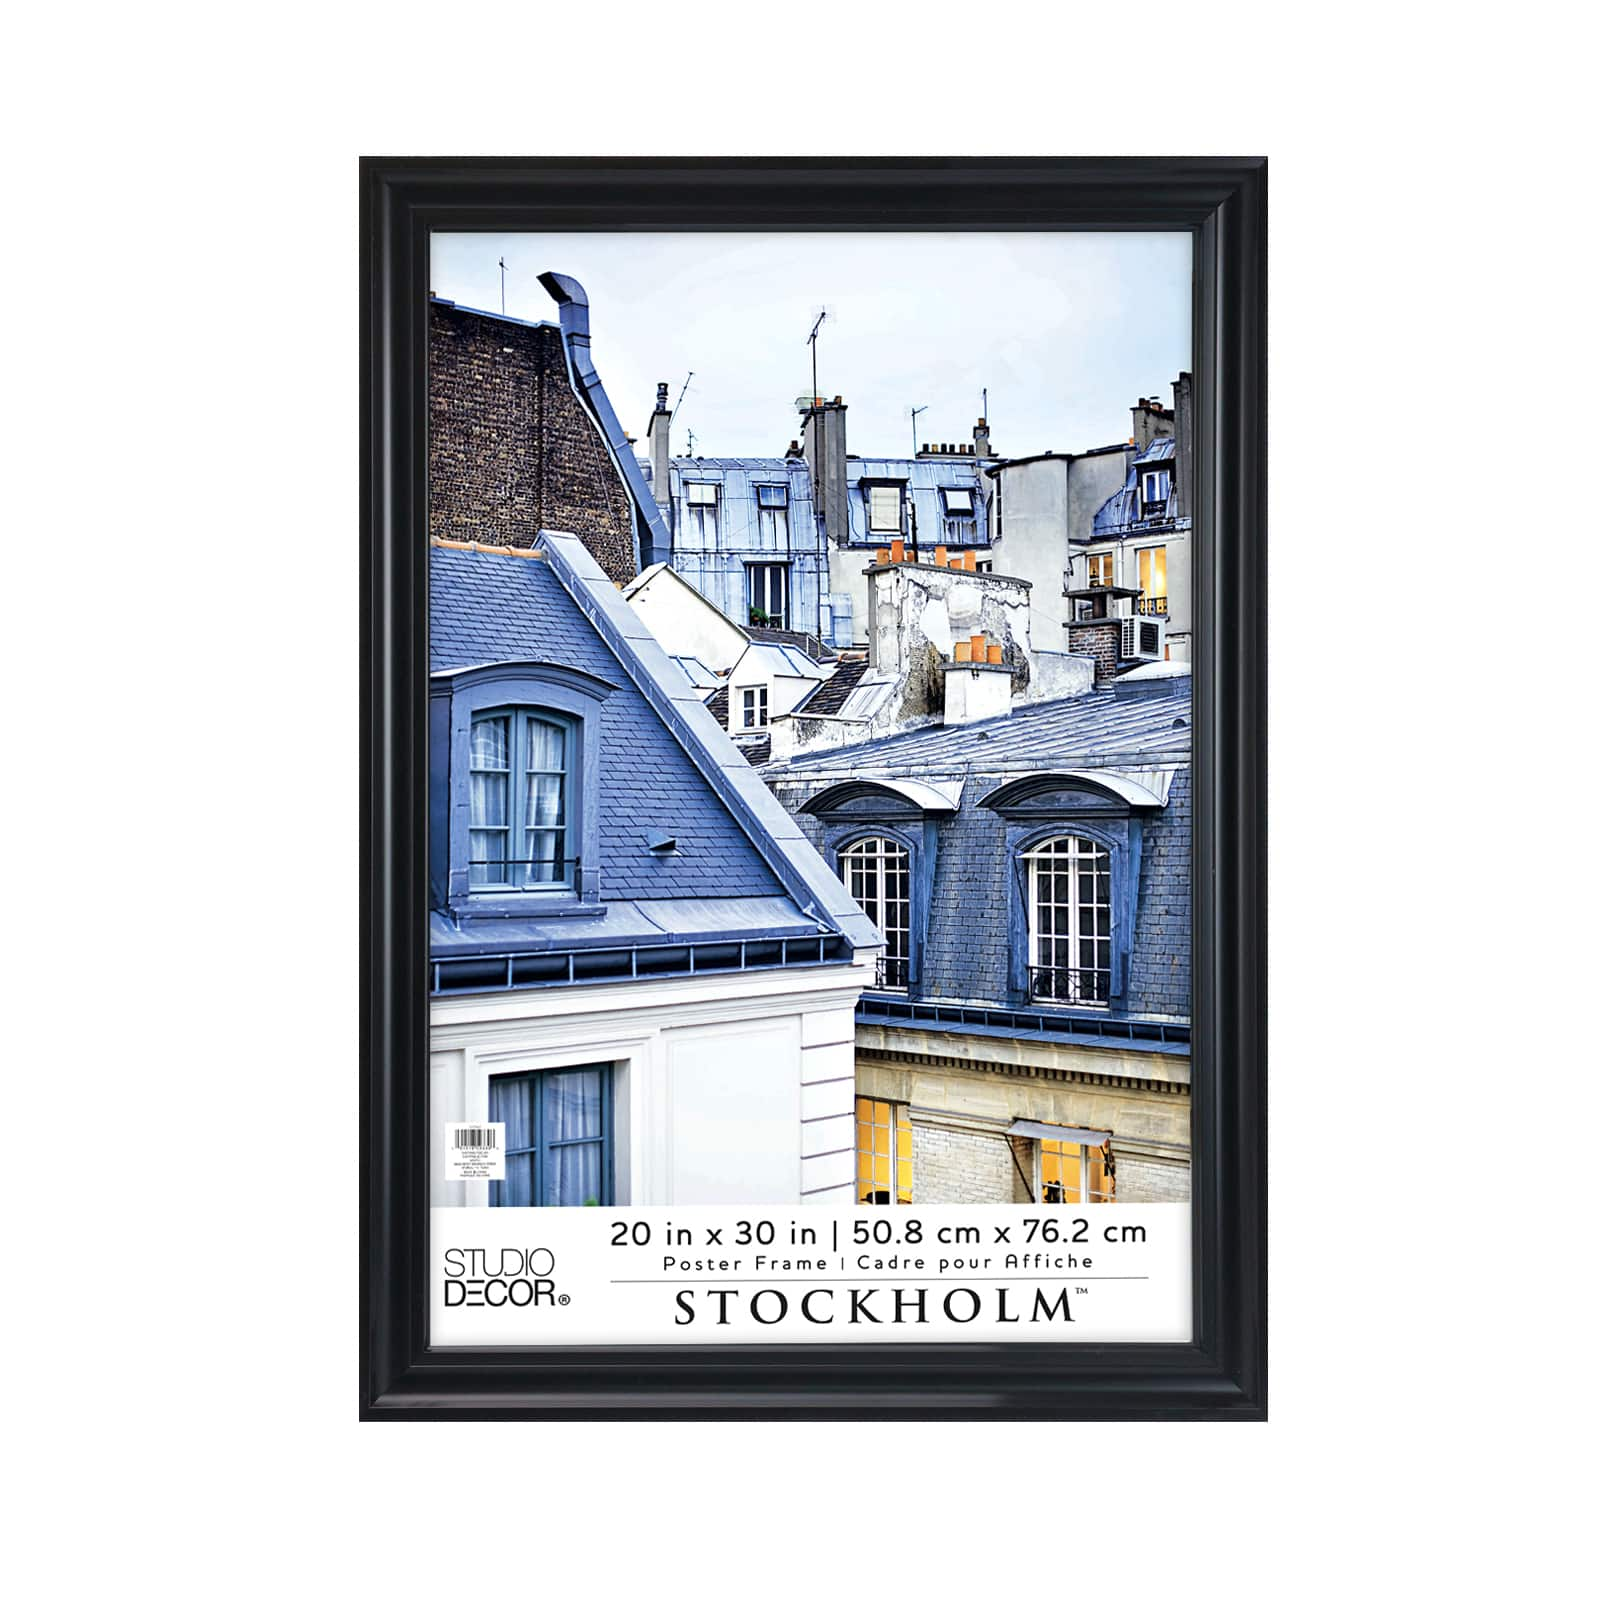 black poster frame stockholm by studio decor